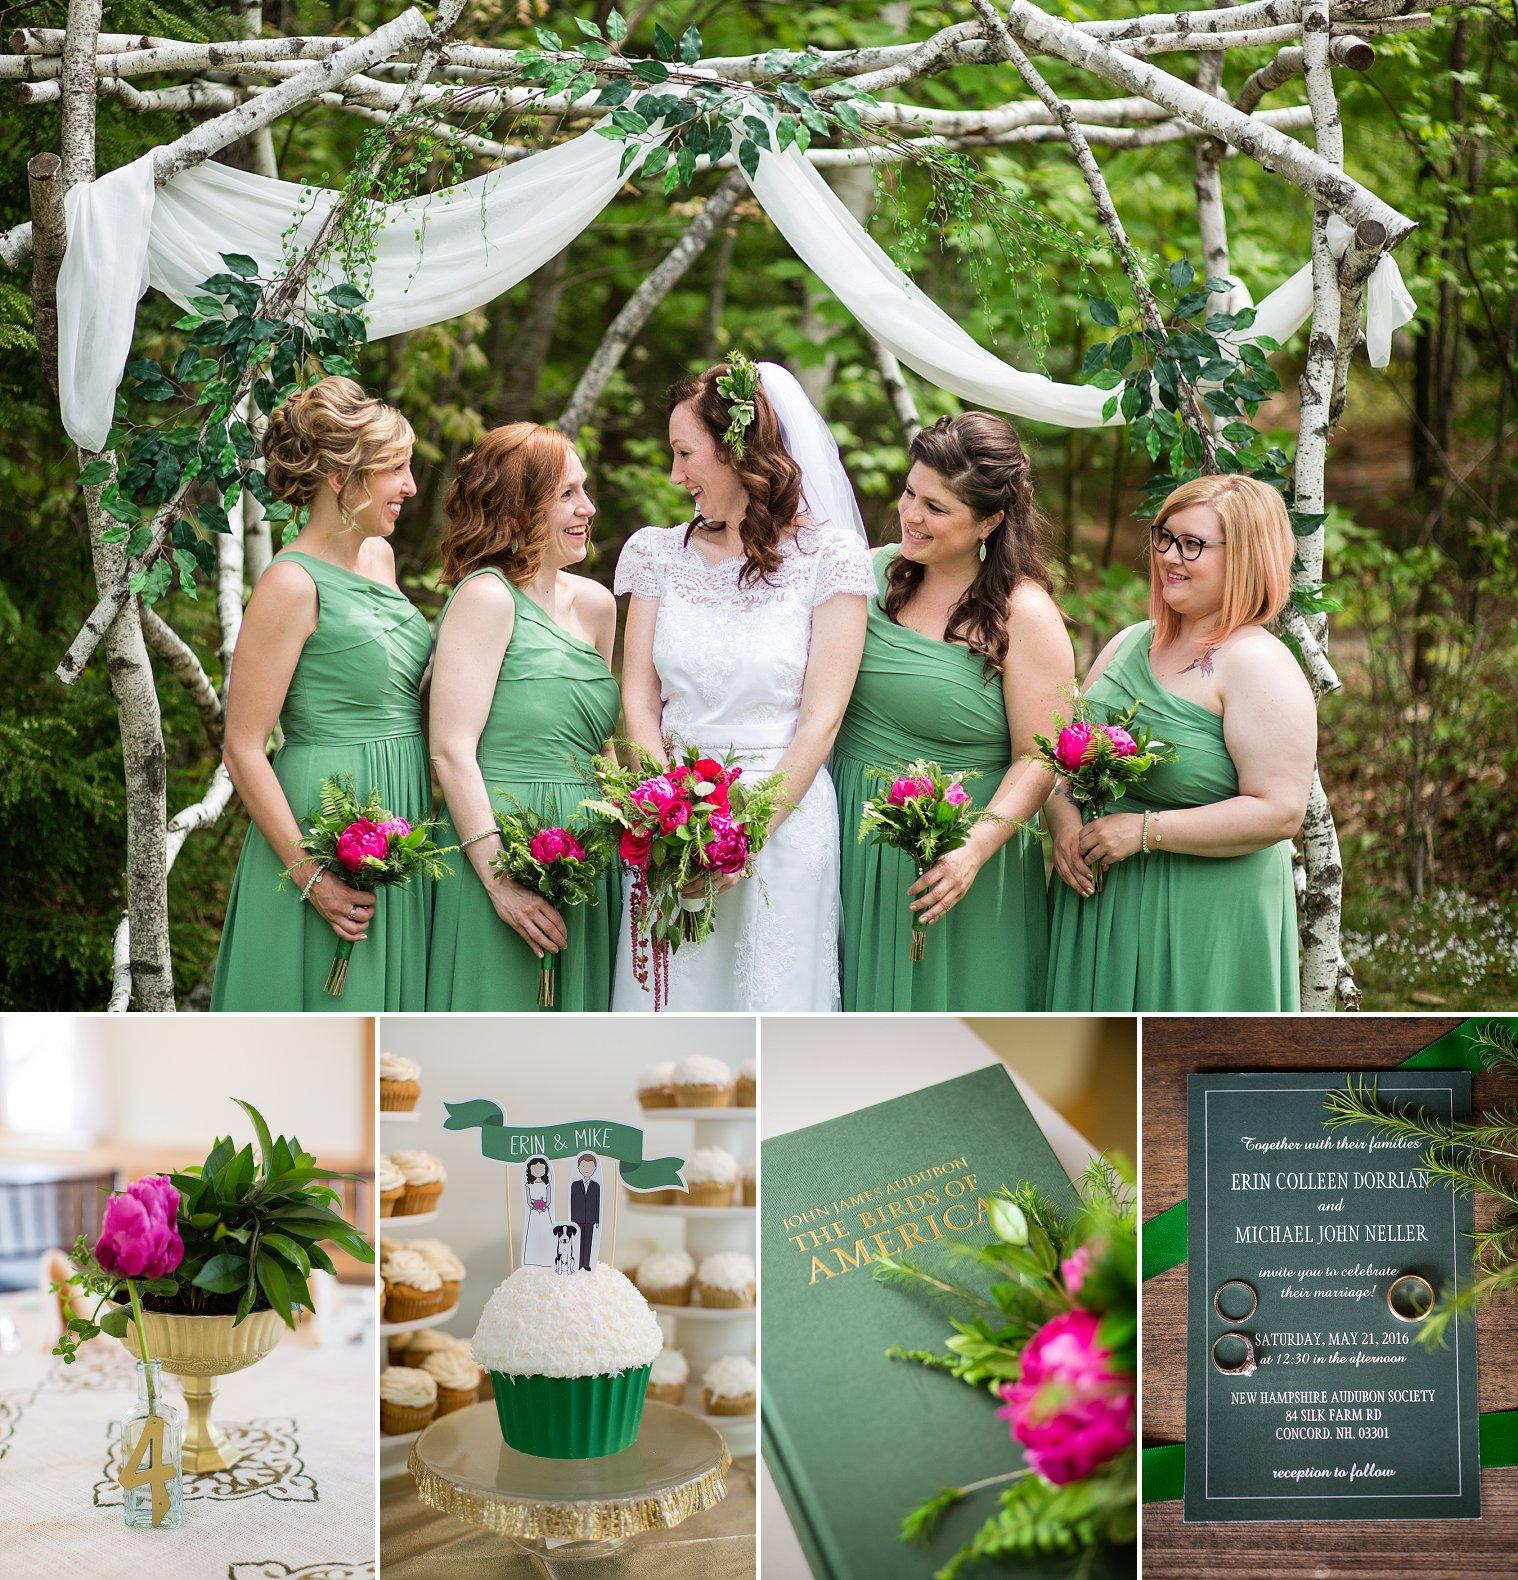 Concord Wedding Center.New Hampshire Audubon Center Wedding Concord Nh Wedding Photographer